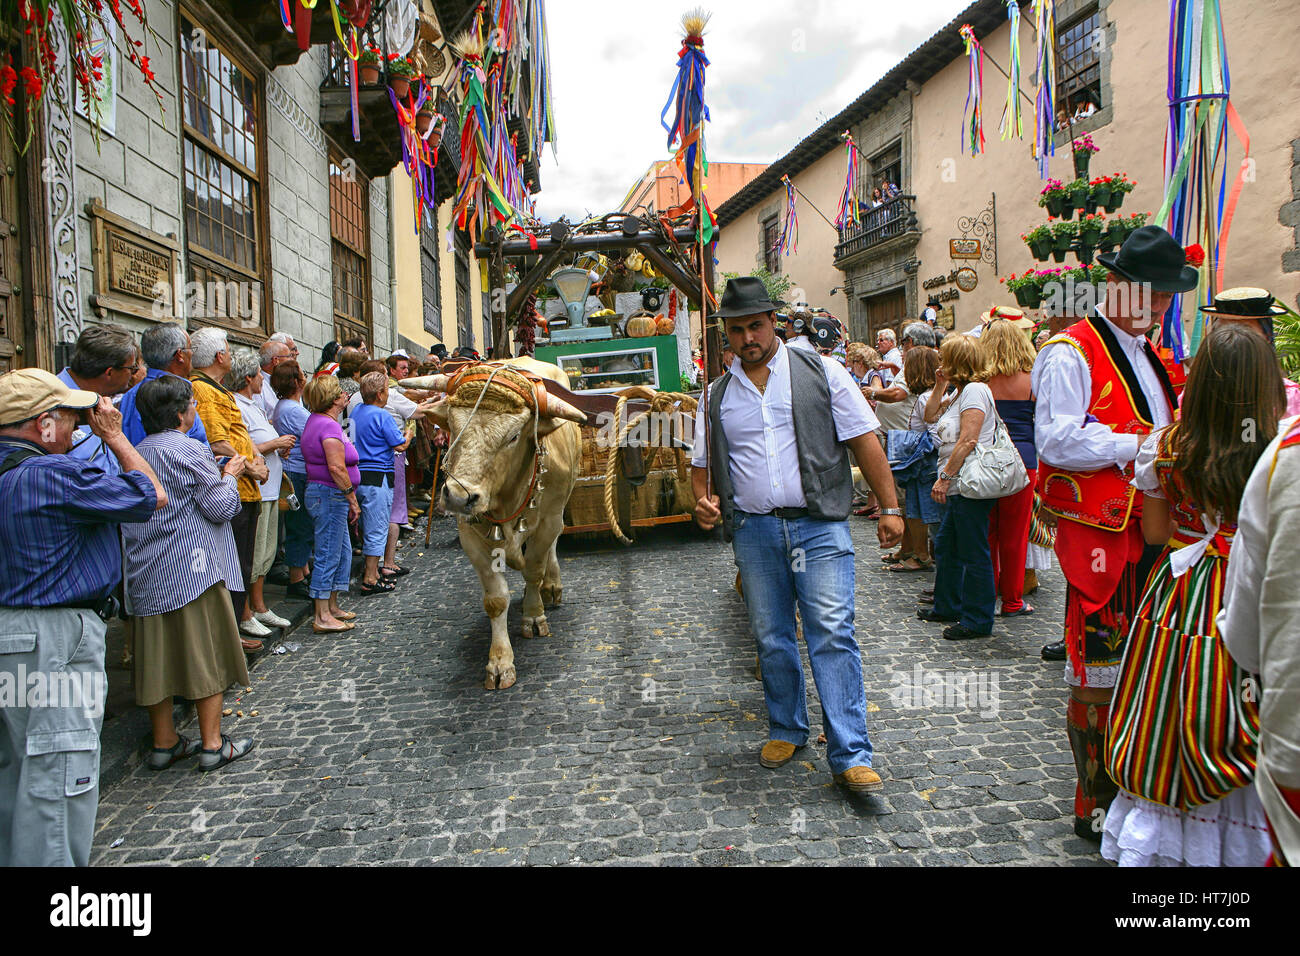 People Wearing Traditional Dress Gathered At Corpus Christi Celebration At La Orotava, Tenerife - Stock Image